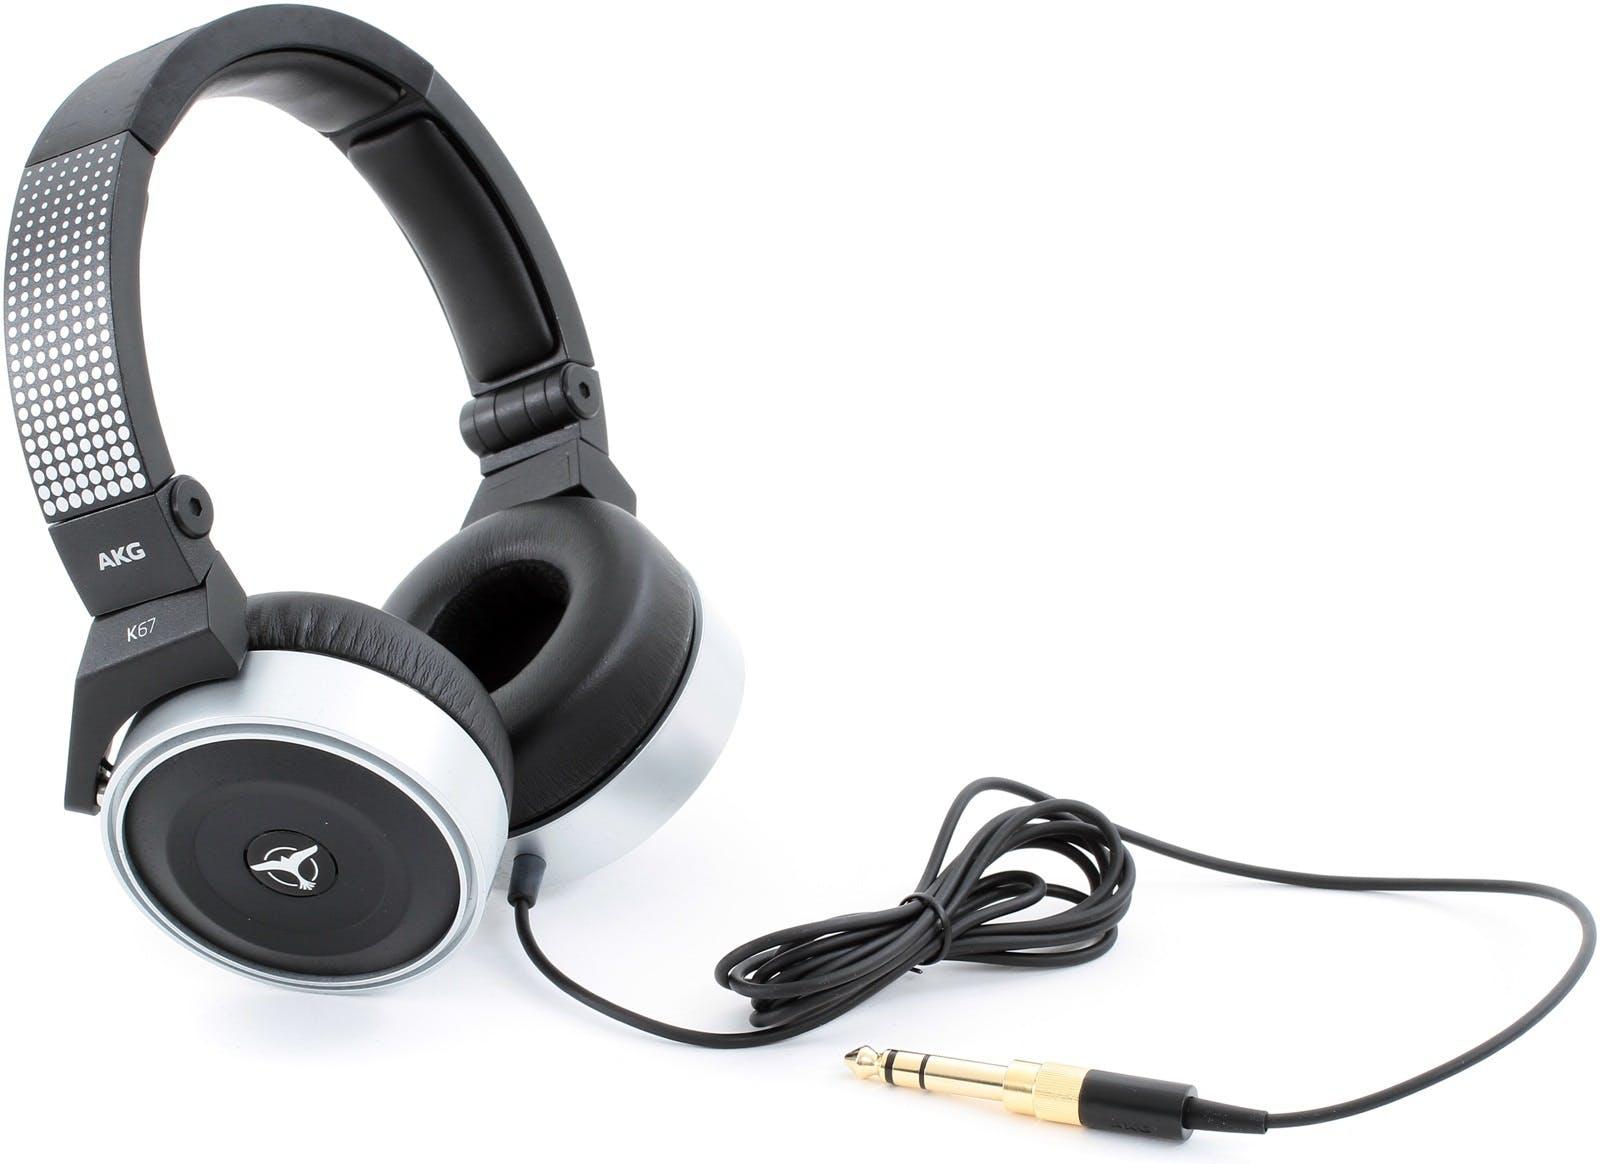 AKG K67 Tiesto DJ Headphones - Andertons Music Co